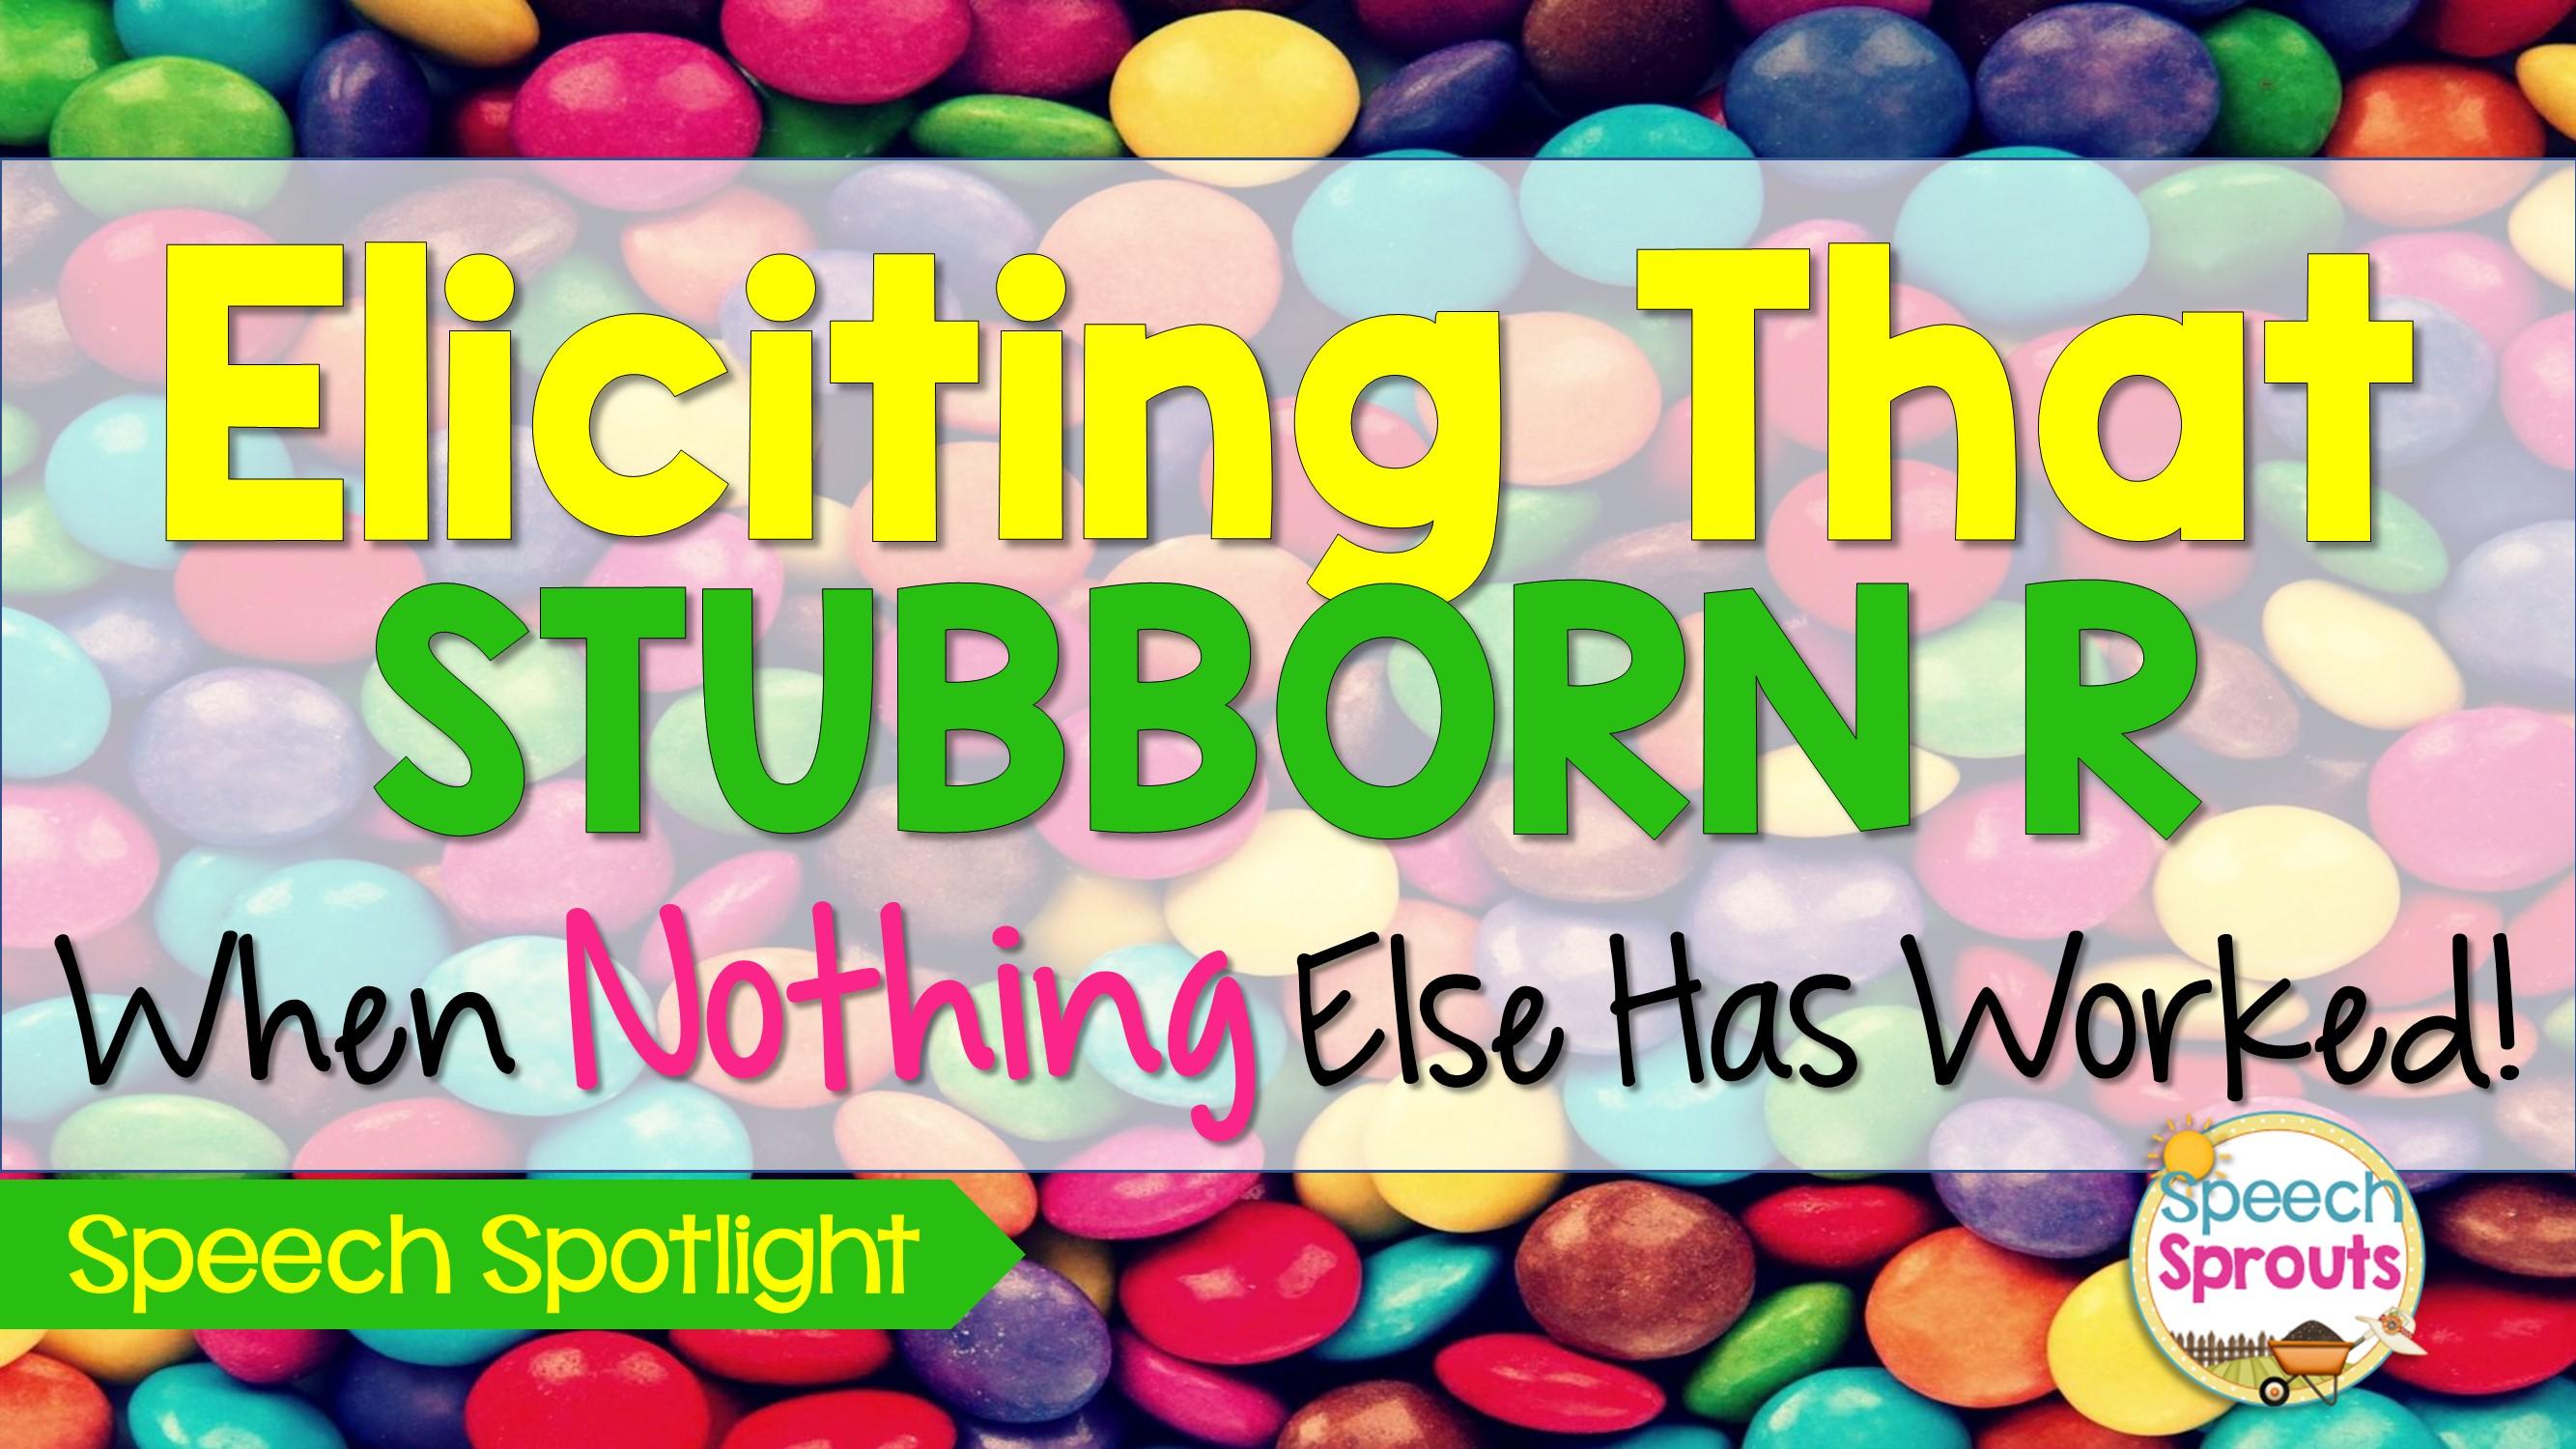 Eliciting that Stubborn R